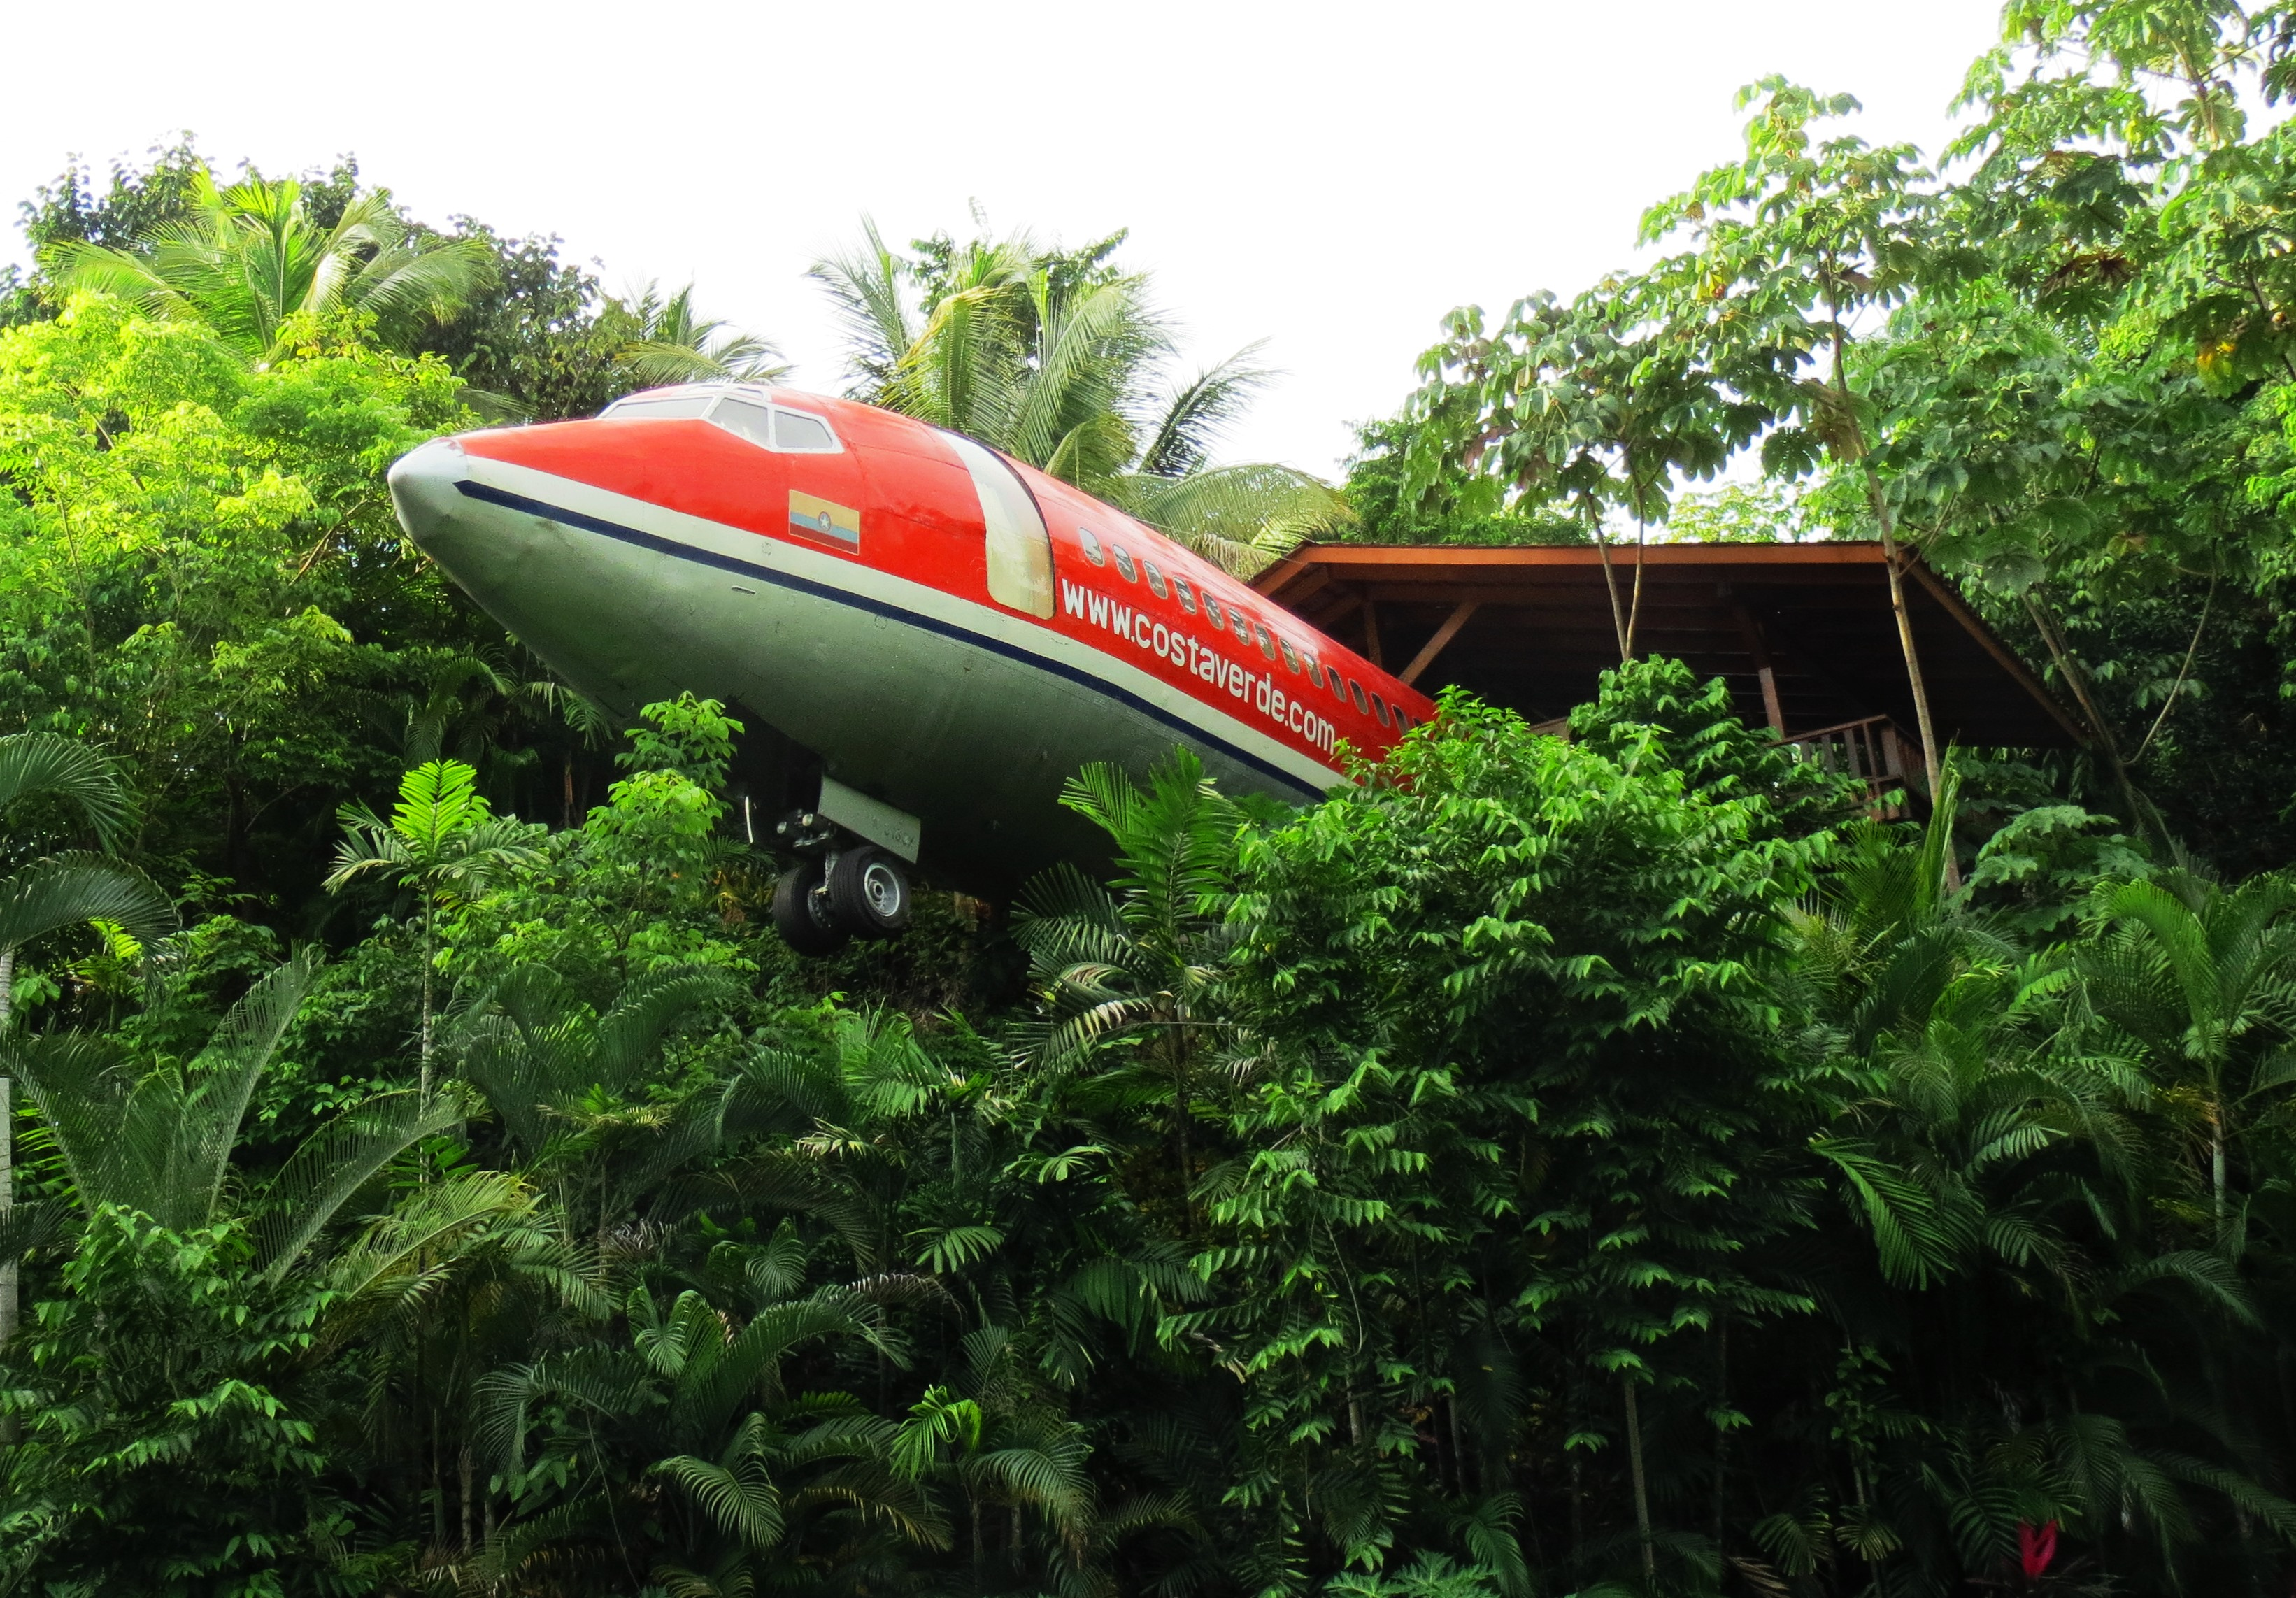 Permalink to Costa Verde Plane Hotel